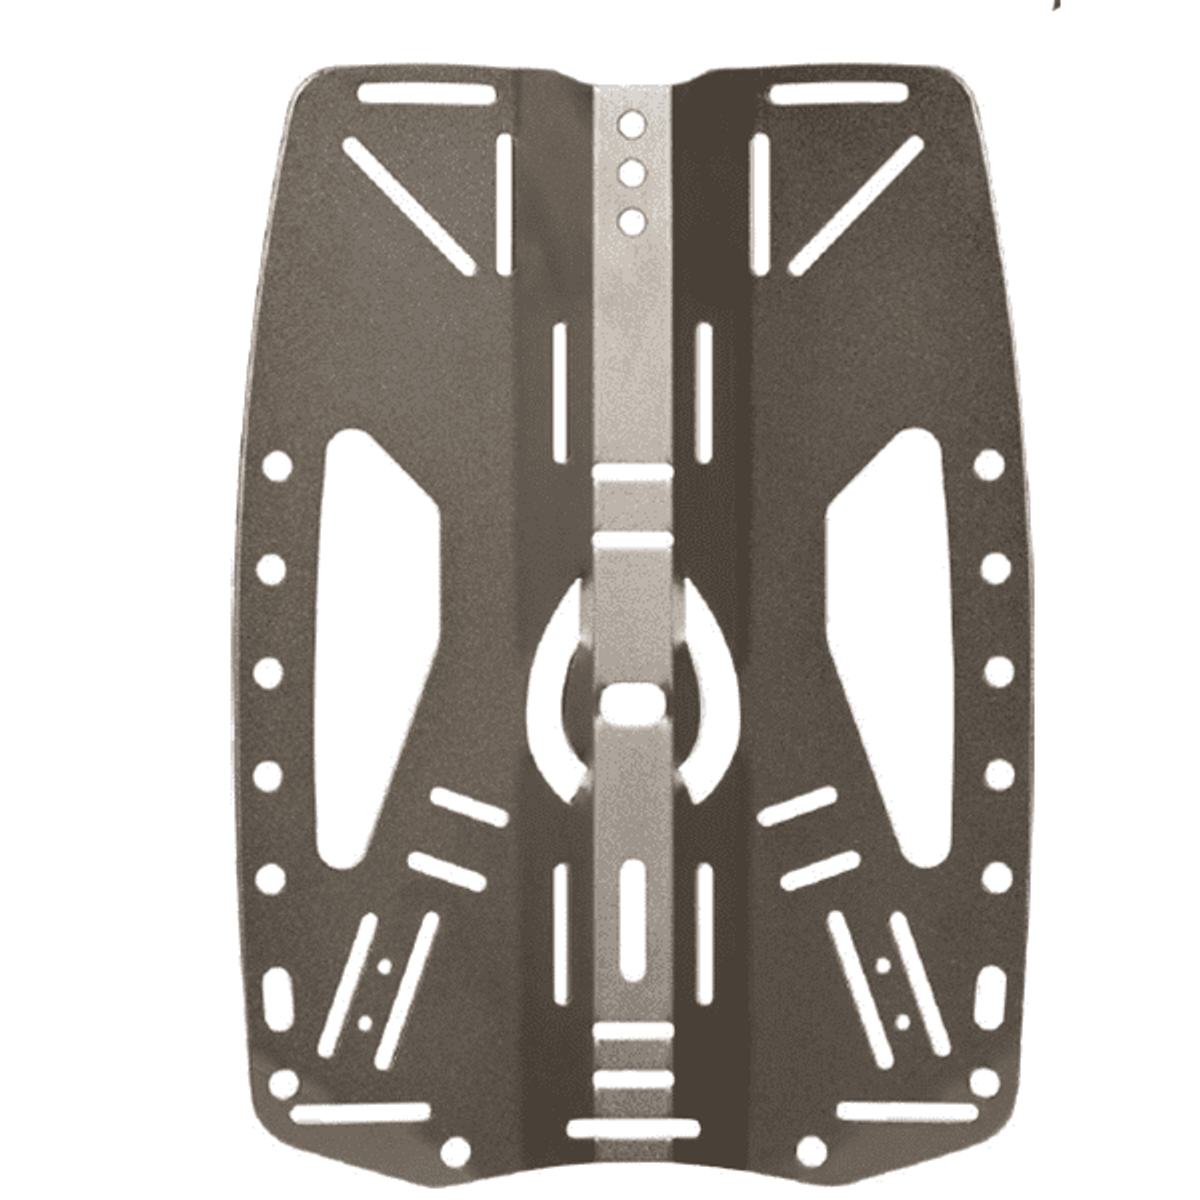 Hollis bakplate 2.0, stål